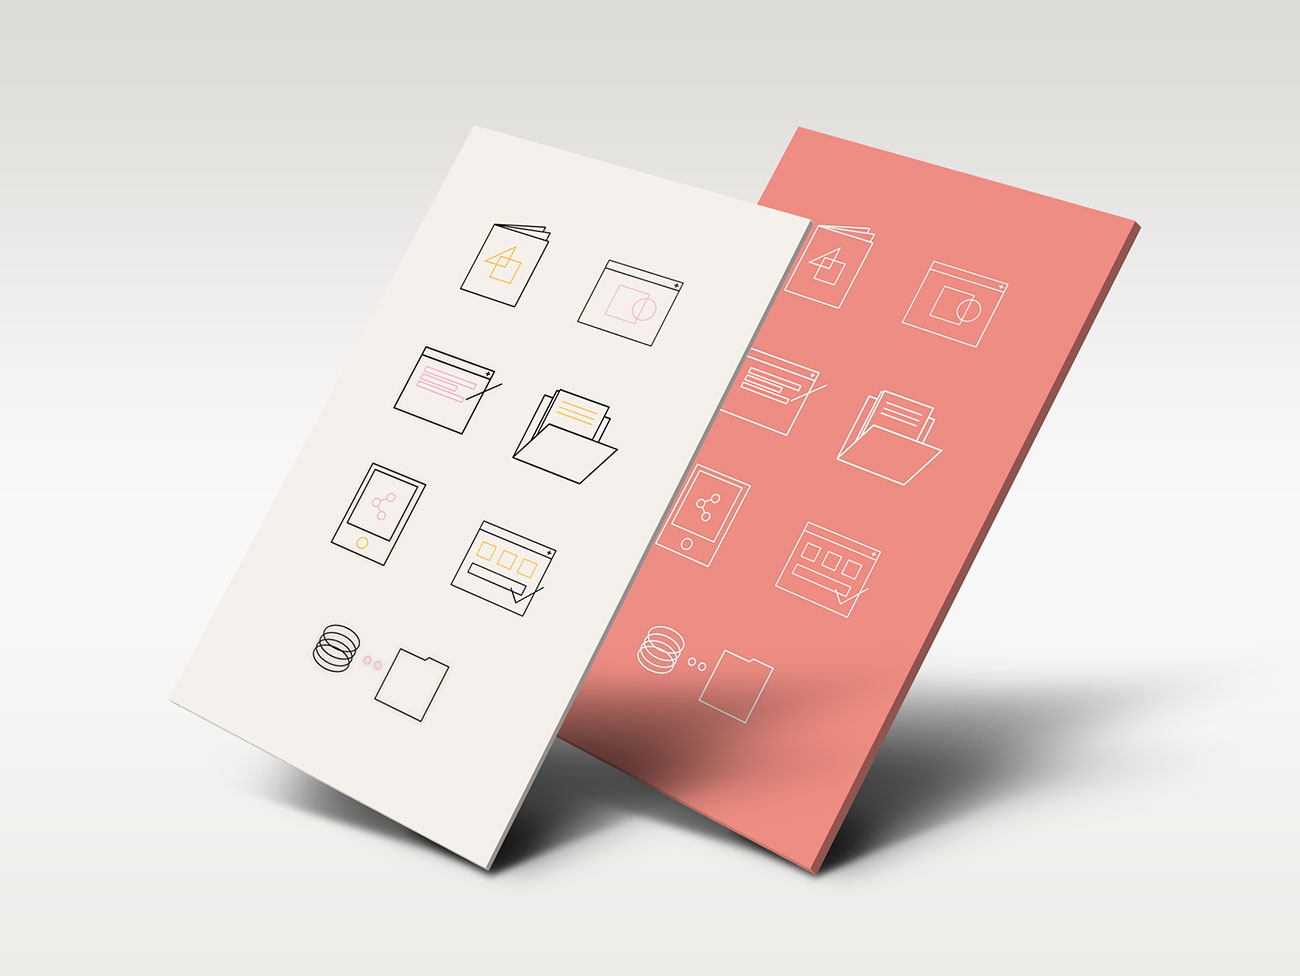 custom-minimalist-icon-set-application